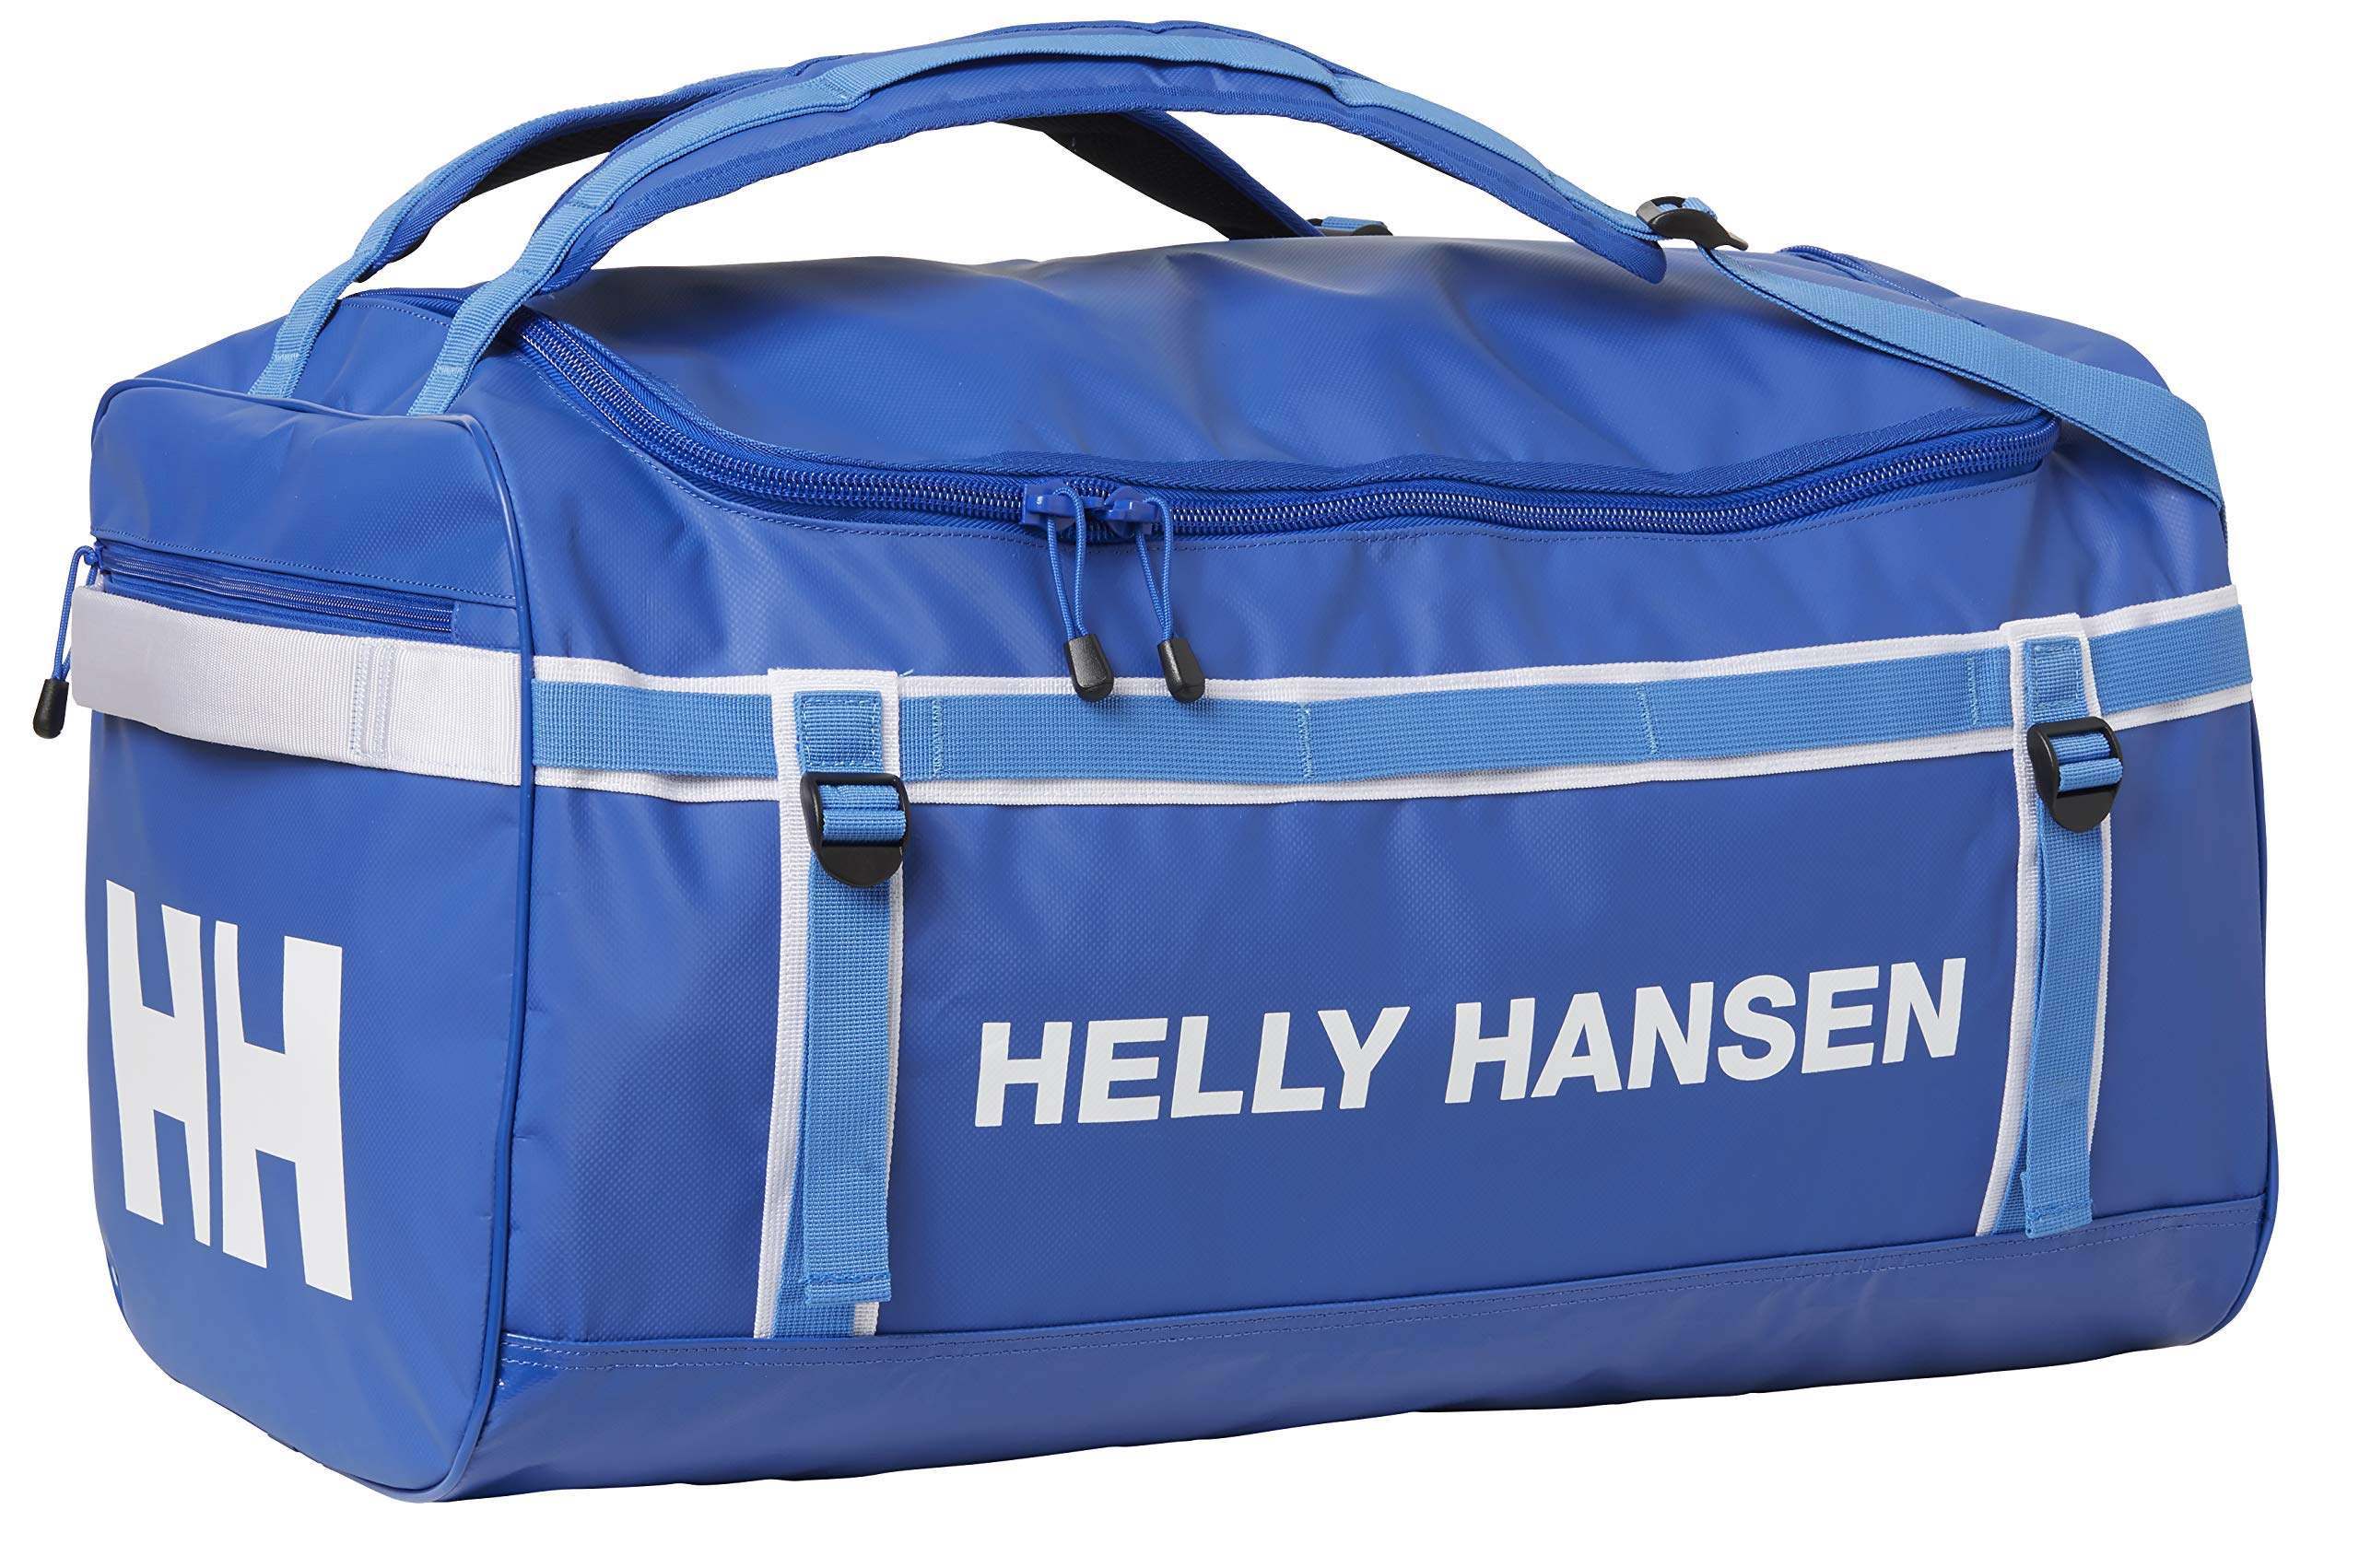 Helly Hansen Unisex Classic Durable Waterproof Duffel Bag, Olympian Blue, Standard/Large by Helly Hansen